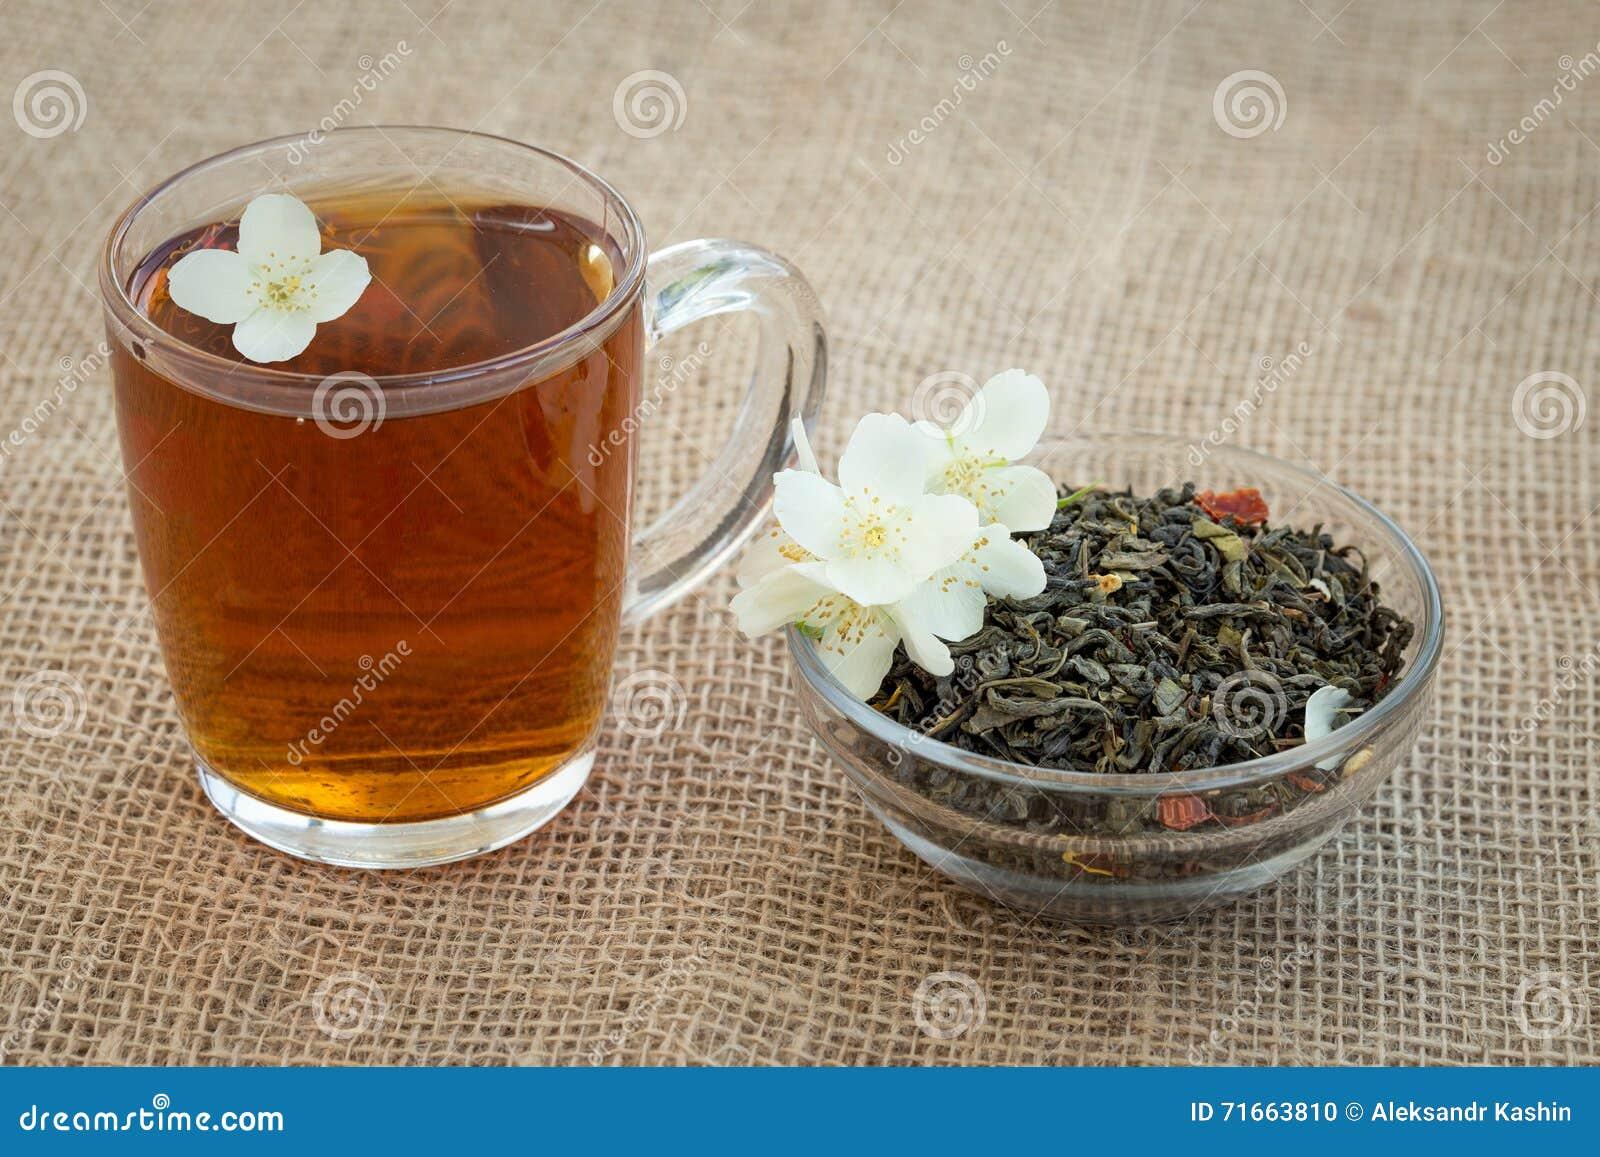 Mug Of Tea And Dried Green Tea With Jasmine Flowers Stock Photo